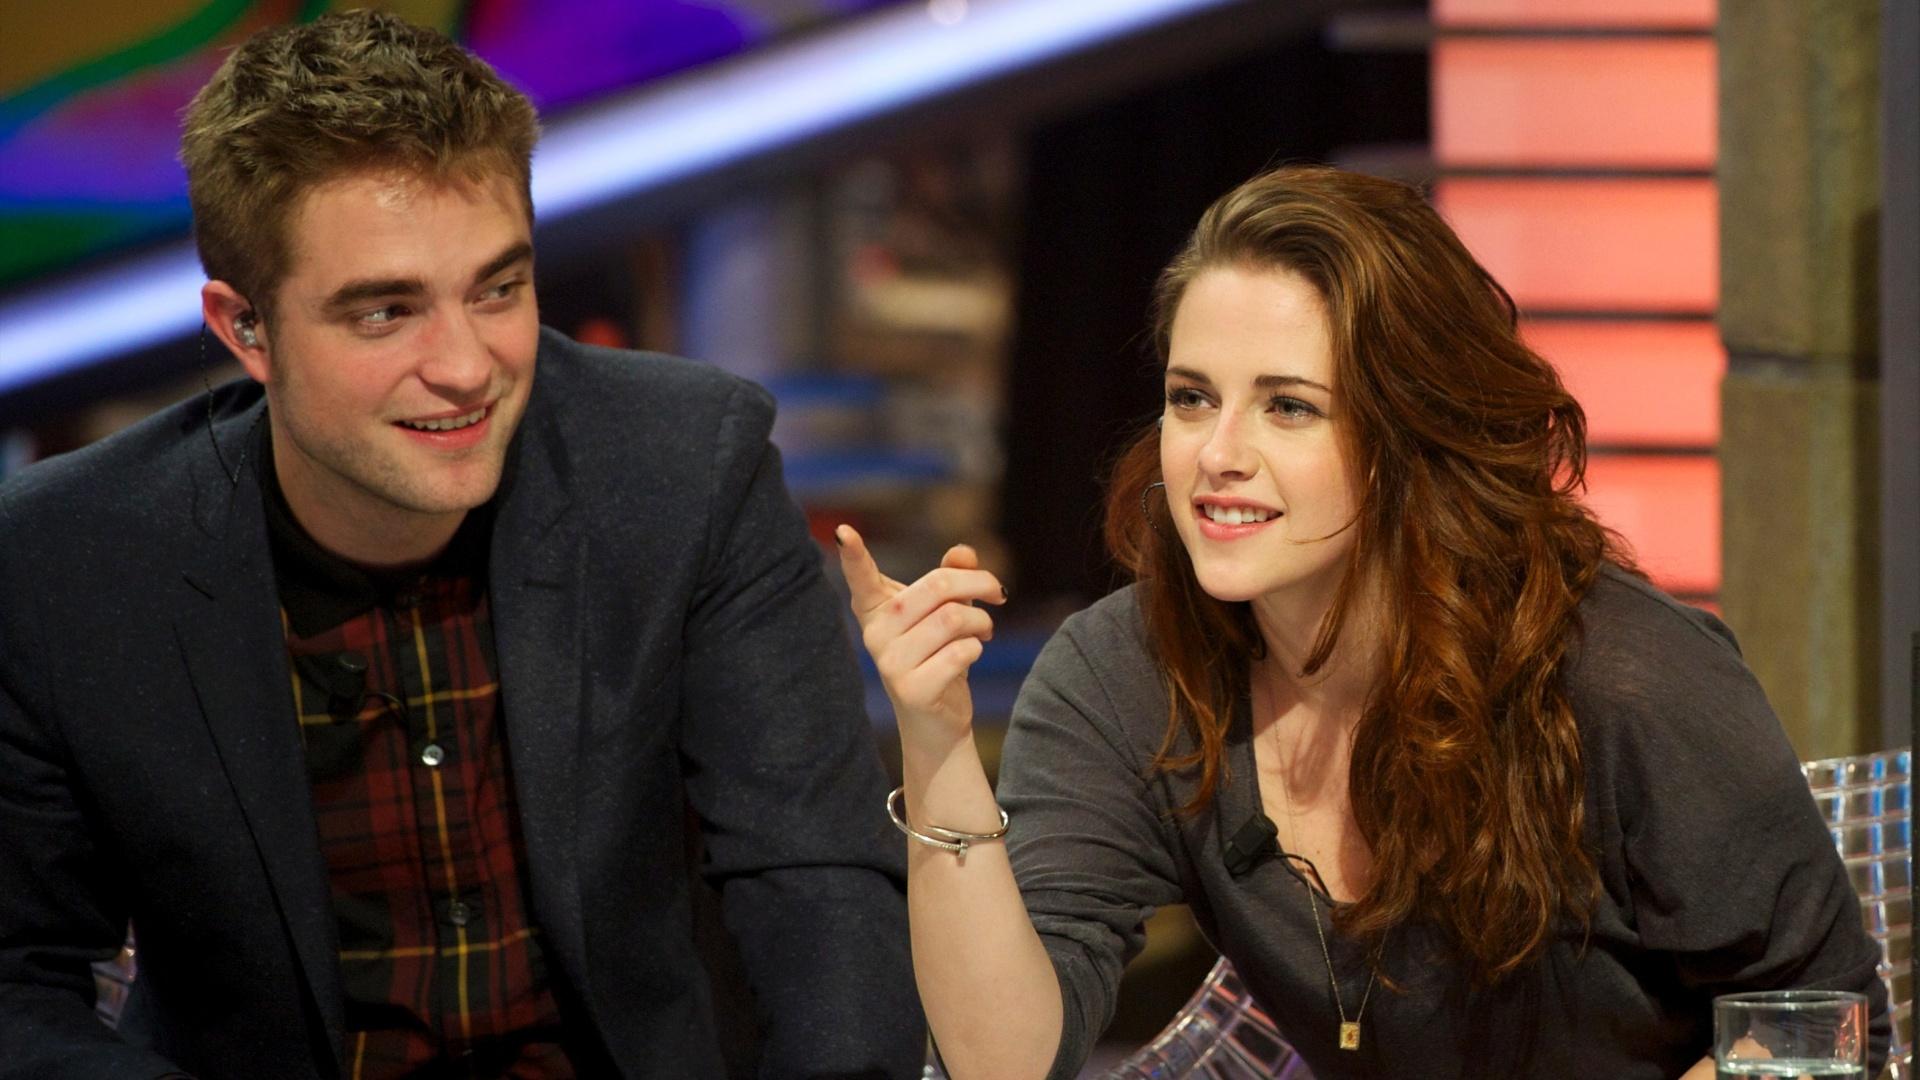 15.nov.2012 - Robert Pattinson e Kristen Stewart participam do programa